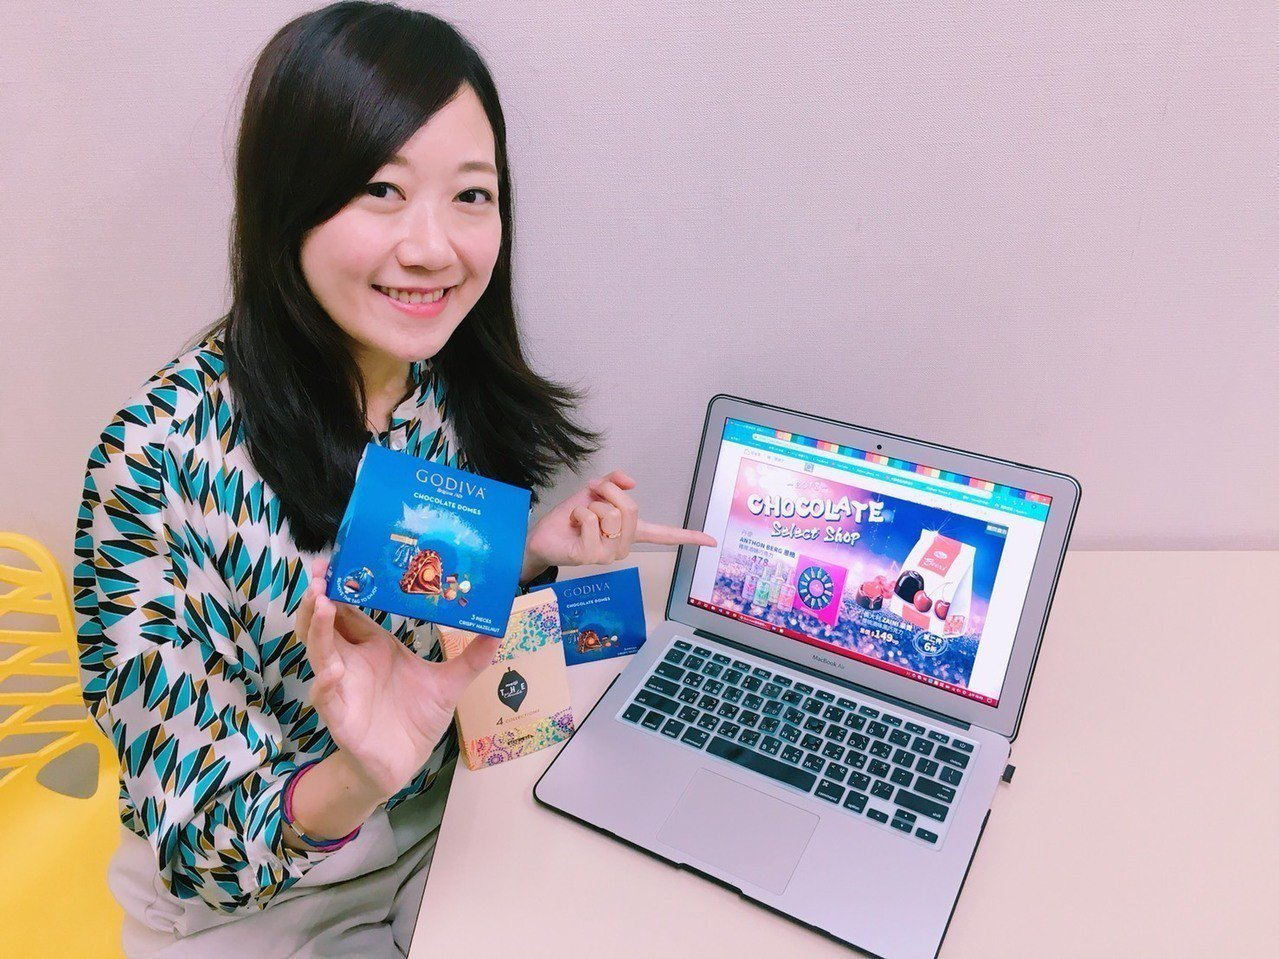 7-ELEVEN 線上 購物 網站 ibon mart 即日 起 推出 「Chocolate s ...